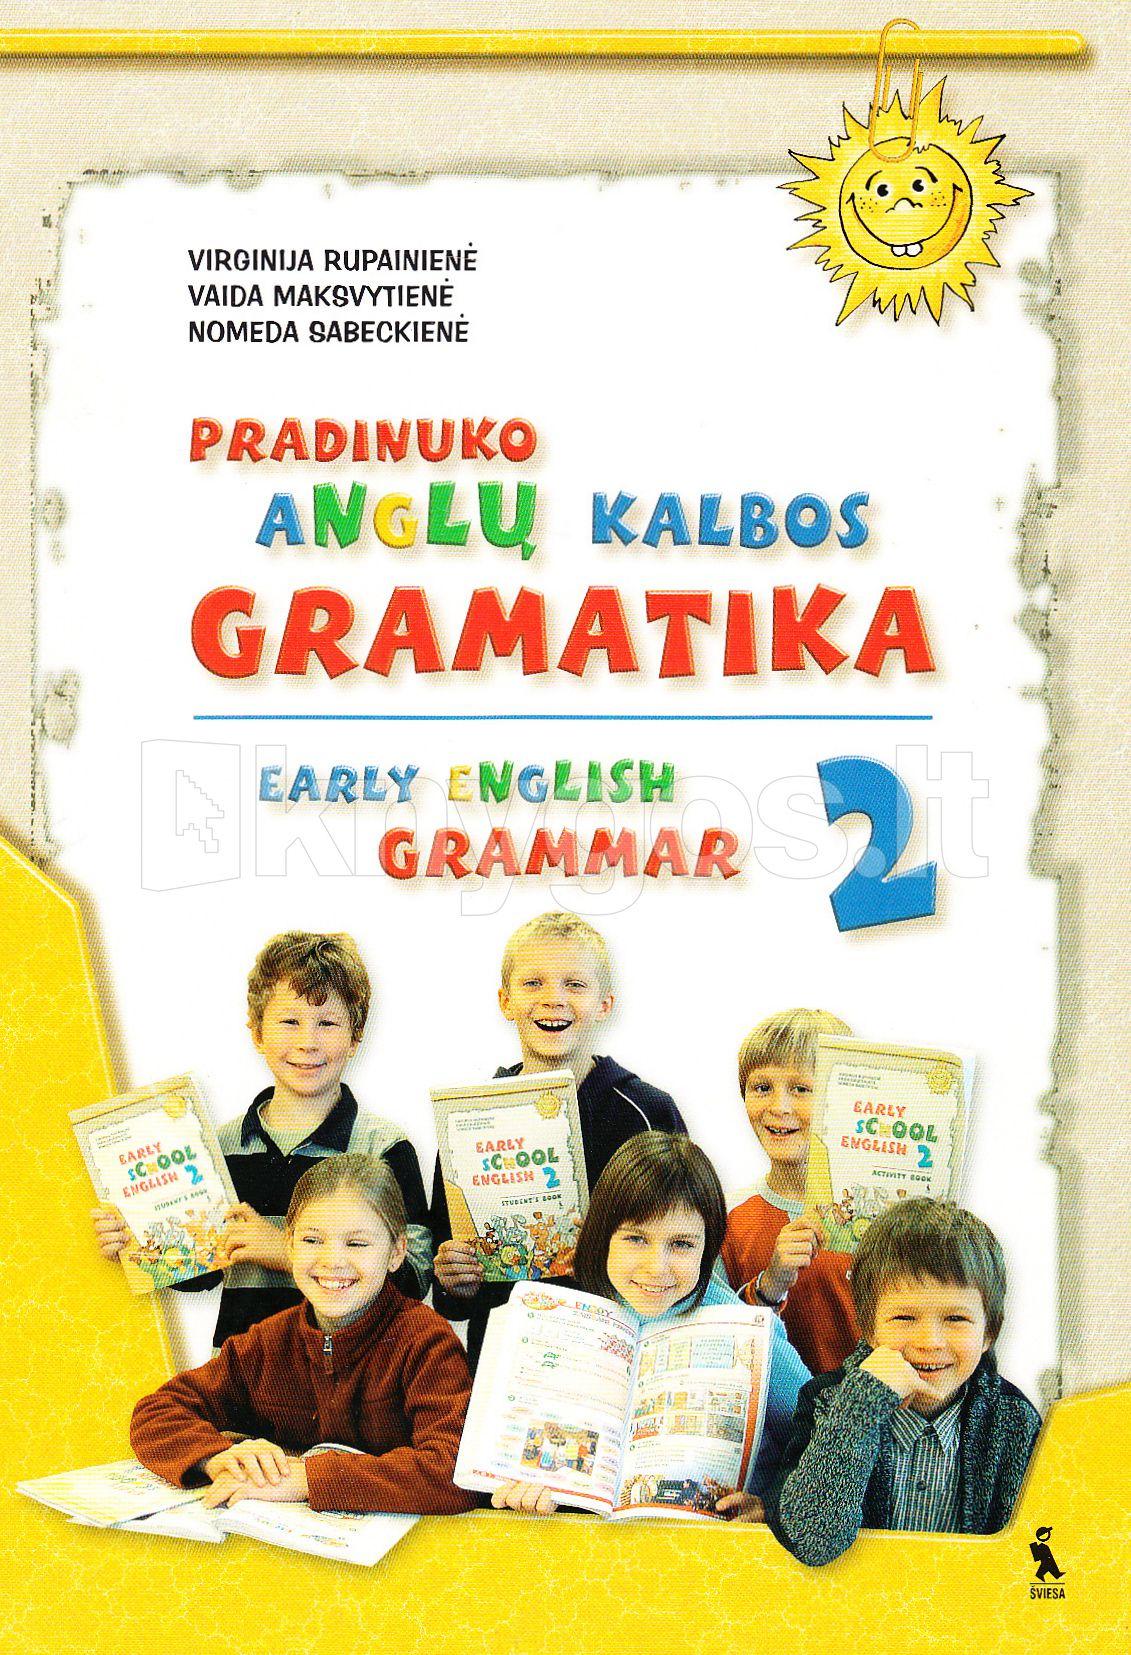 Anglu kalbos gramatika